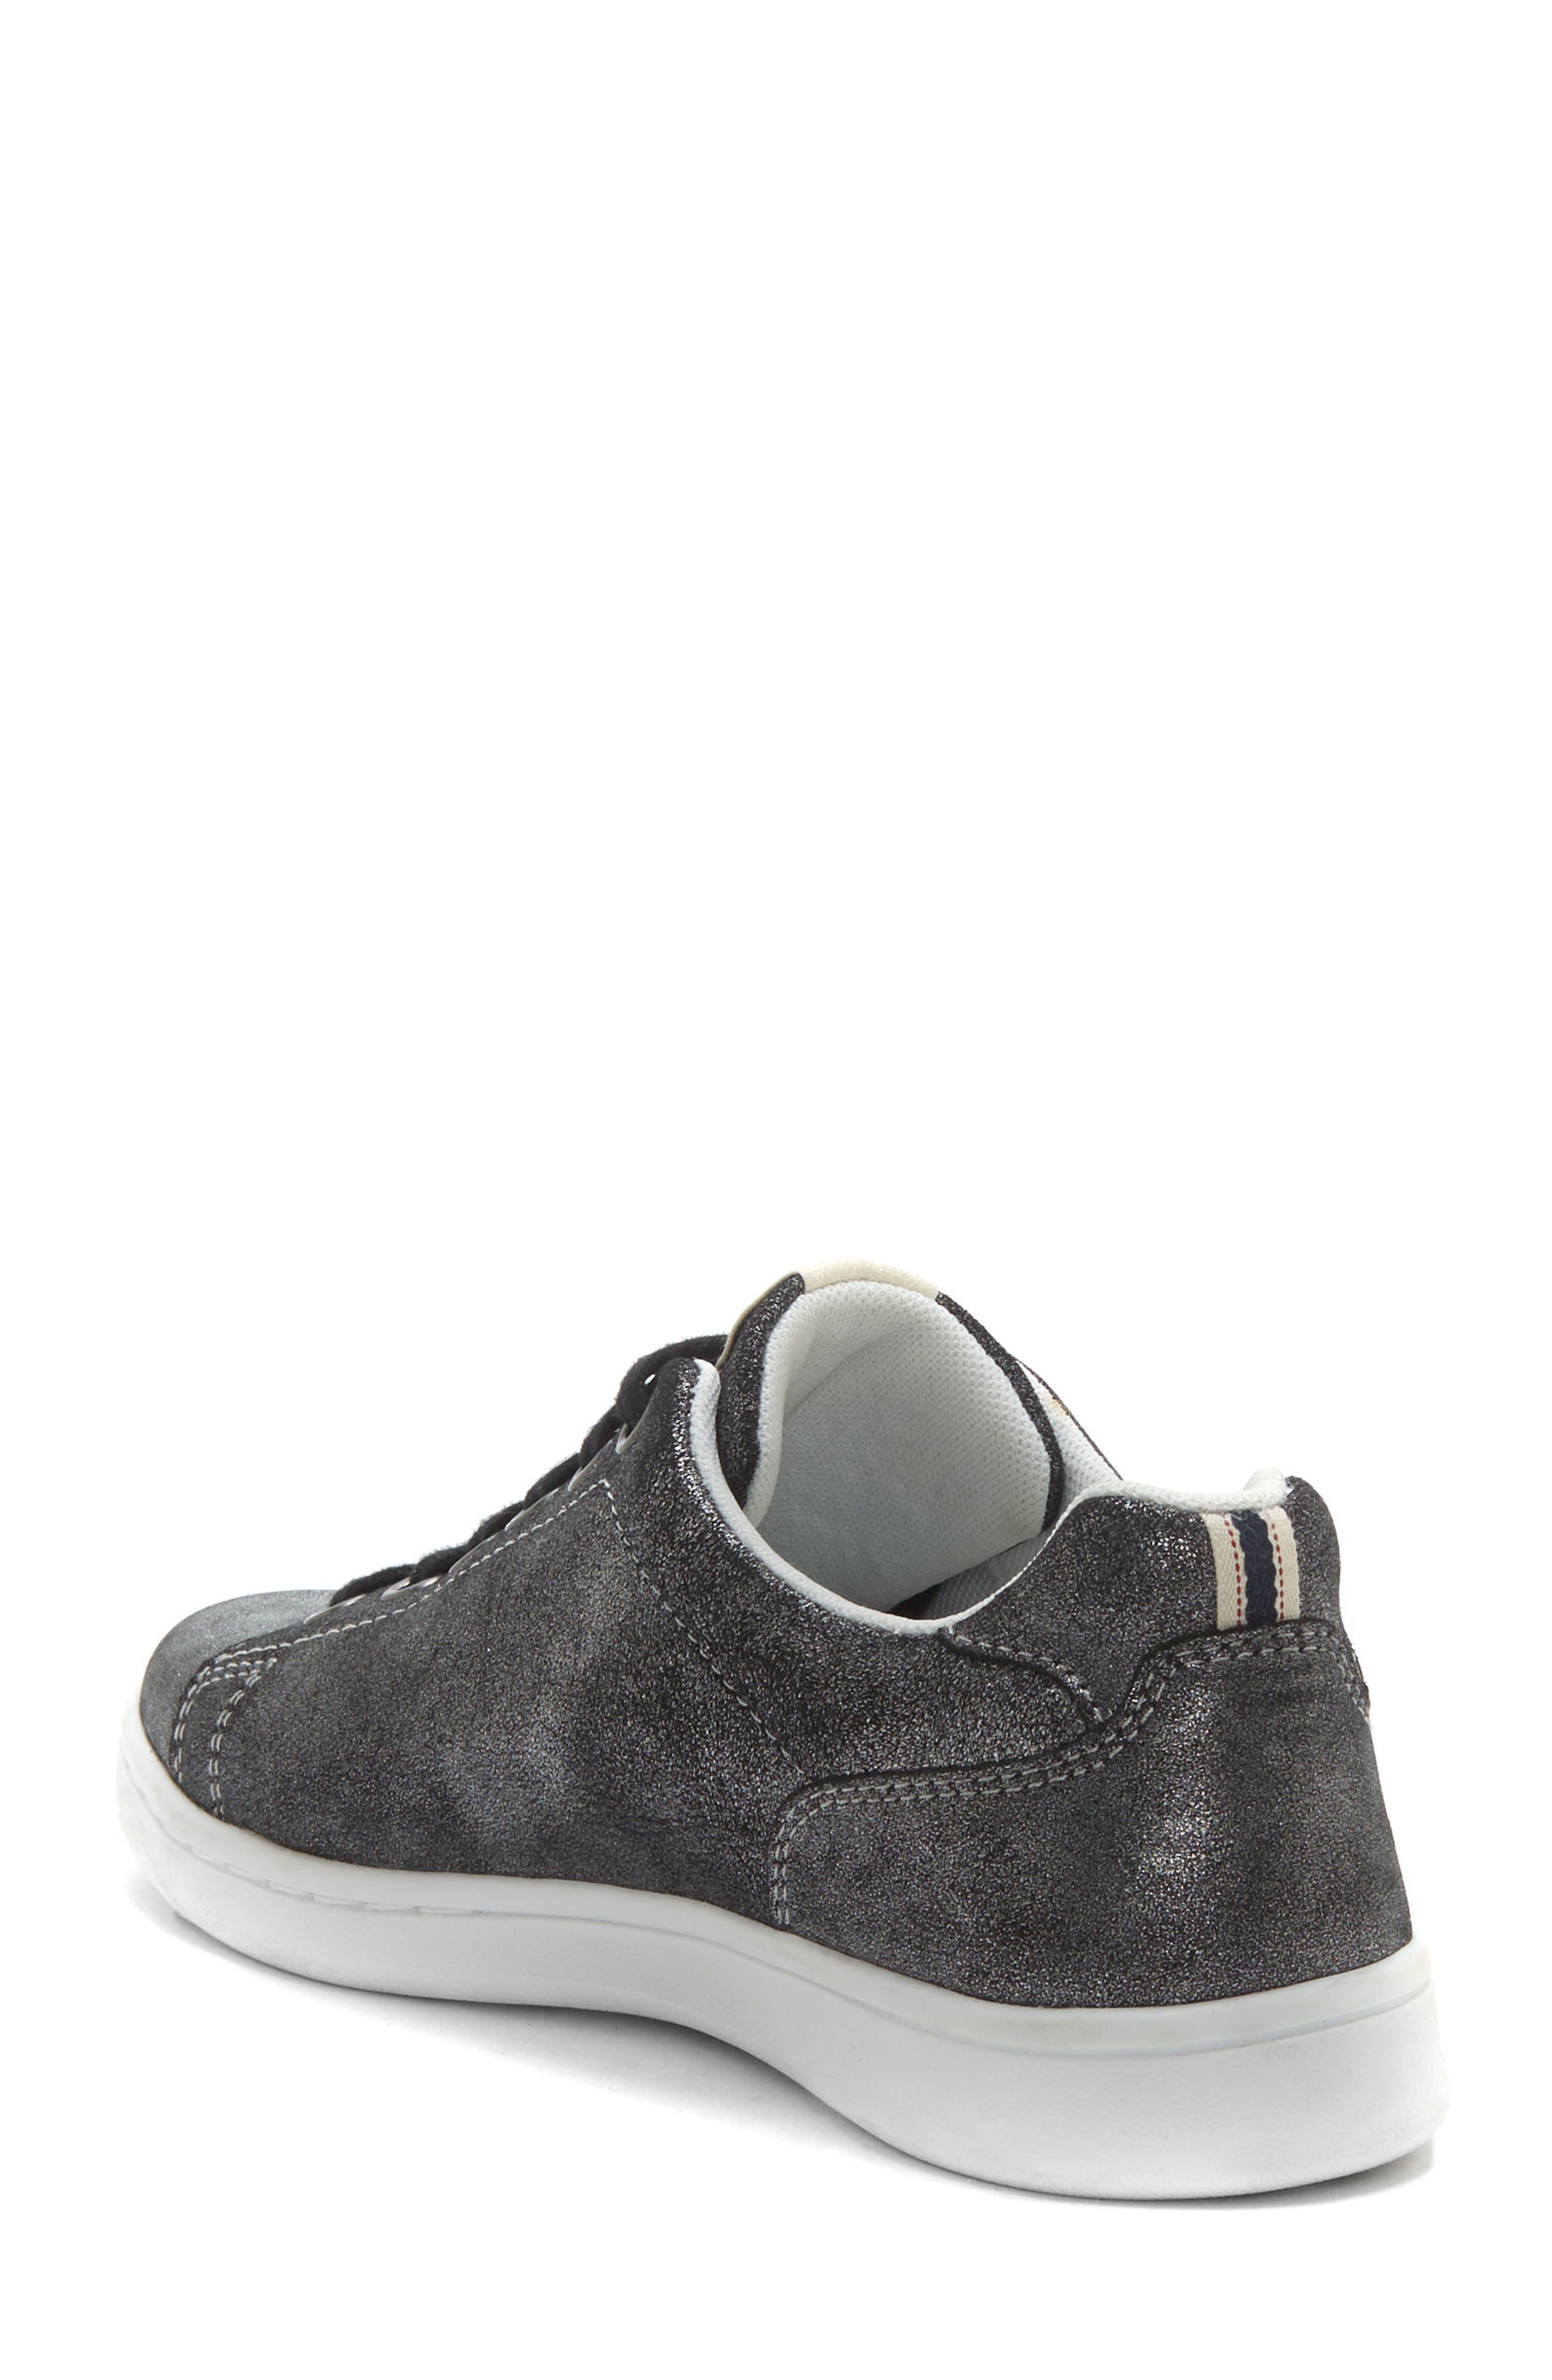 Alternate Image 2  - ED Ellen DeGeneres 'Chapala' Sneaker (Women)